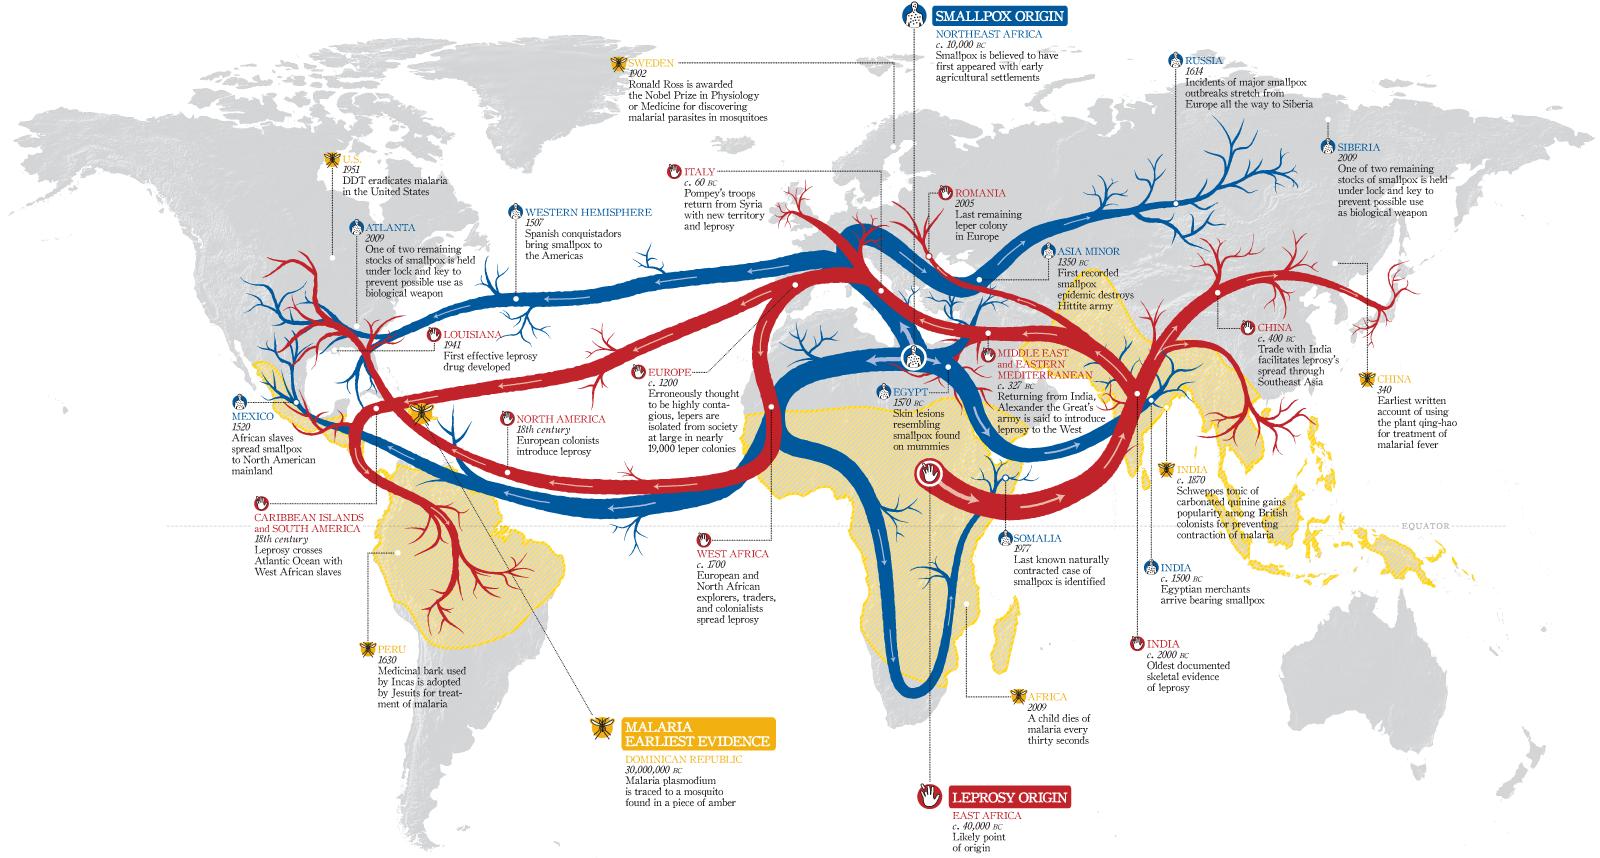 https://i0.wp.com/1.bp.blogspot.com/-iCAvAyJV5rg/Ts01QIvnWtI/AAAAAAAABD0/b_QPKCgeX38/s1600/Disease+Flow+Map+Haisam+Hussein.png